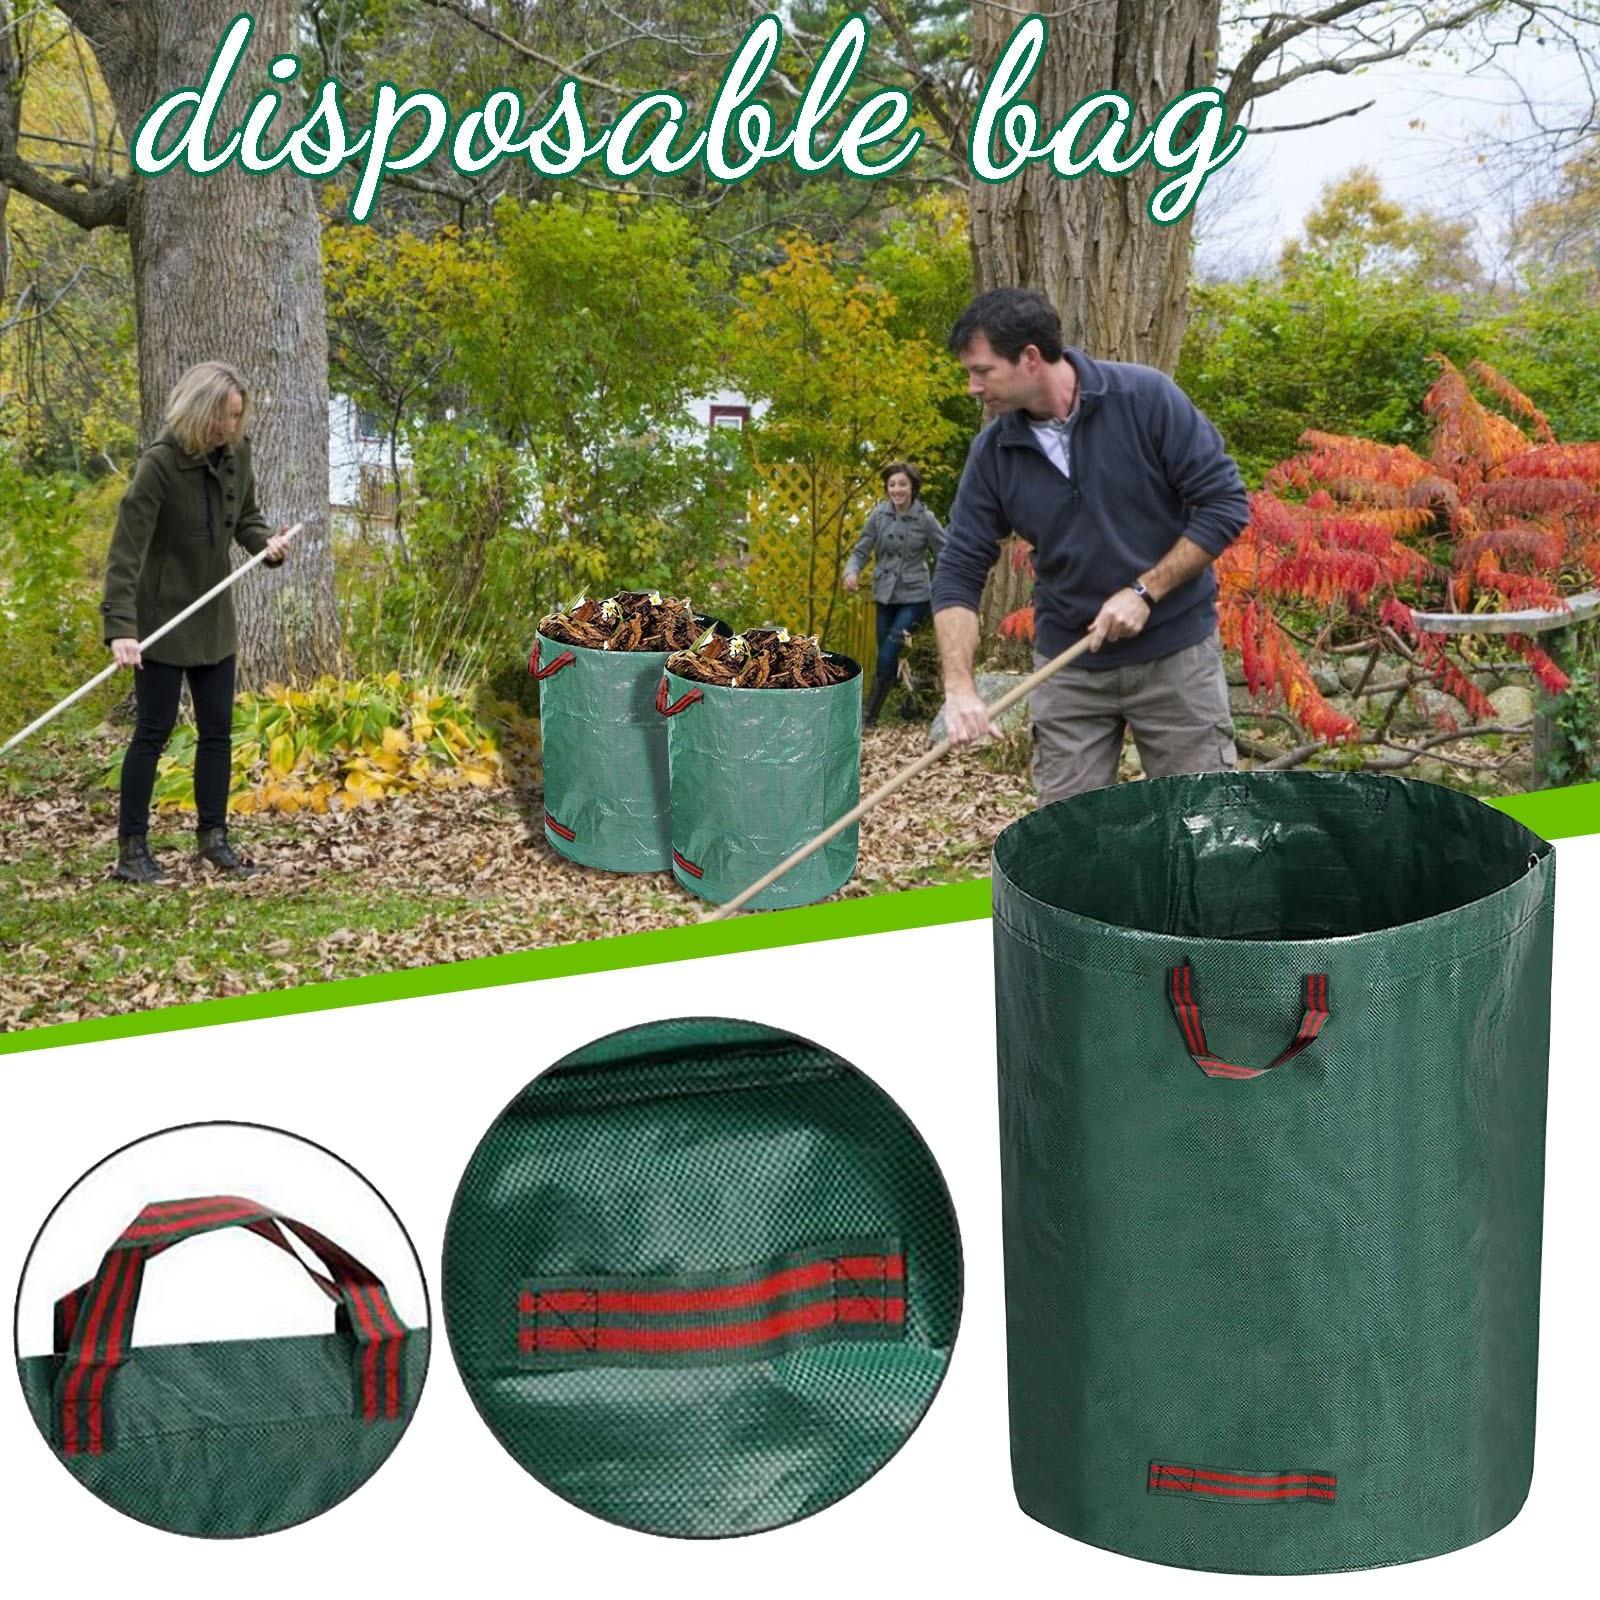 120l/300l Large Capacity Heavy Duty Garden Waste Bag Garden Rubble Waste Woven Rubbish Bags Yard Waste Bins Storage#g3